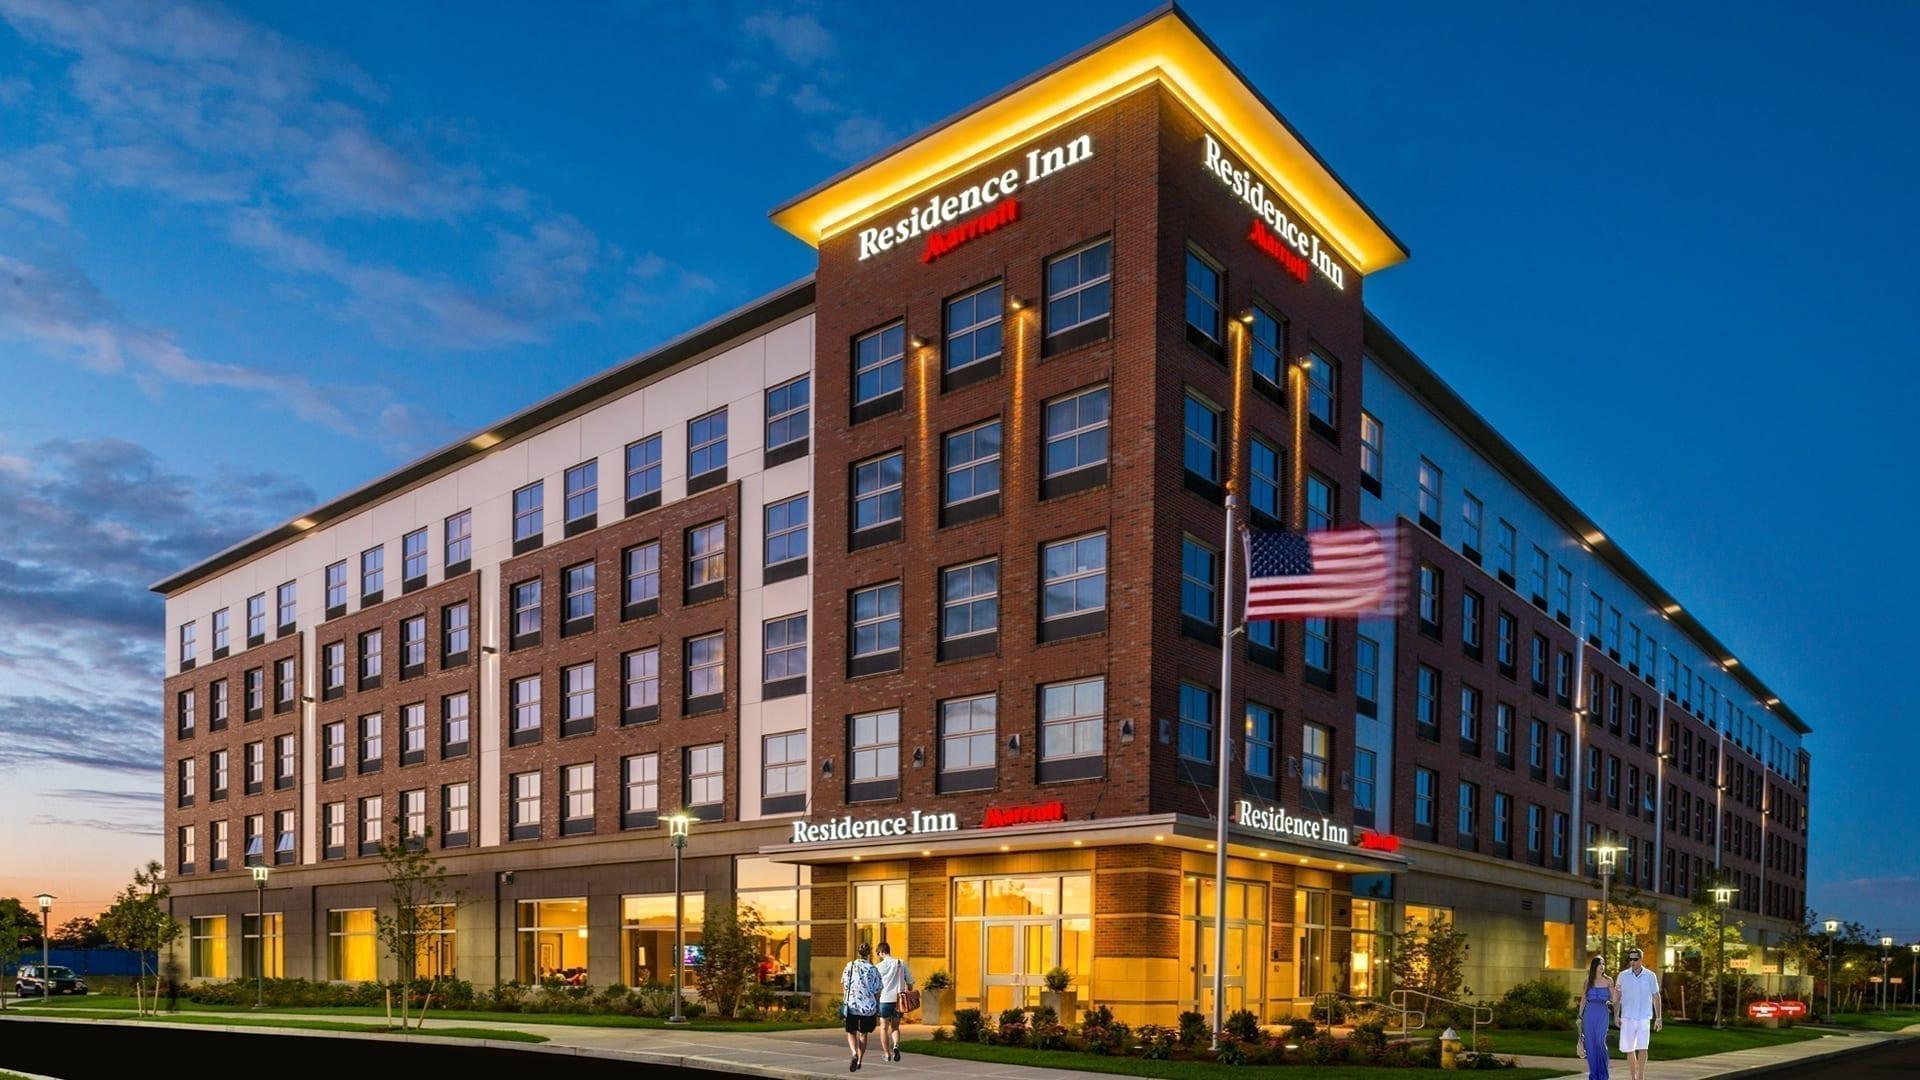 Residence Inn Marriott Hotel Design Architecture - Wichita Falls